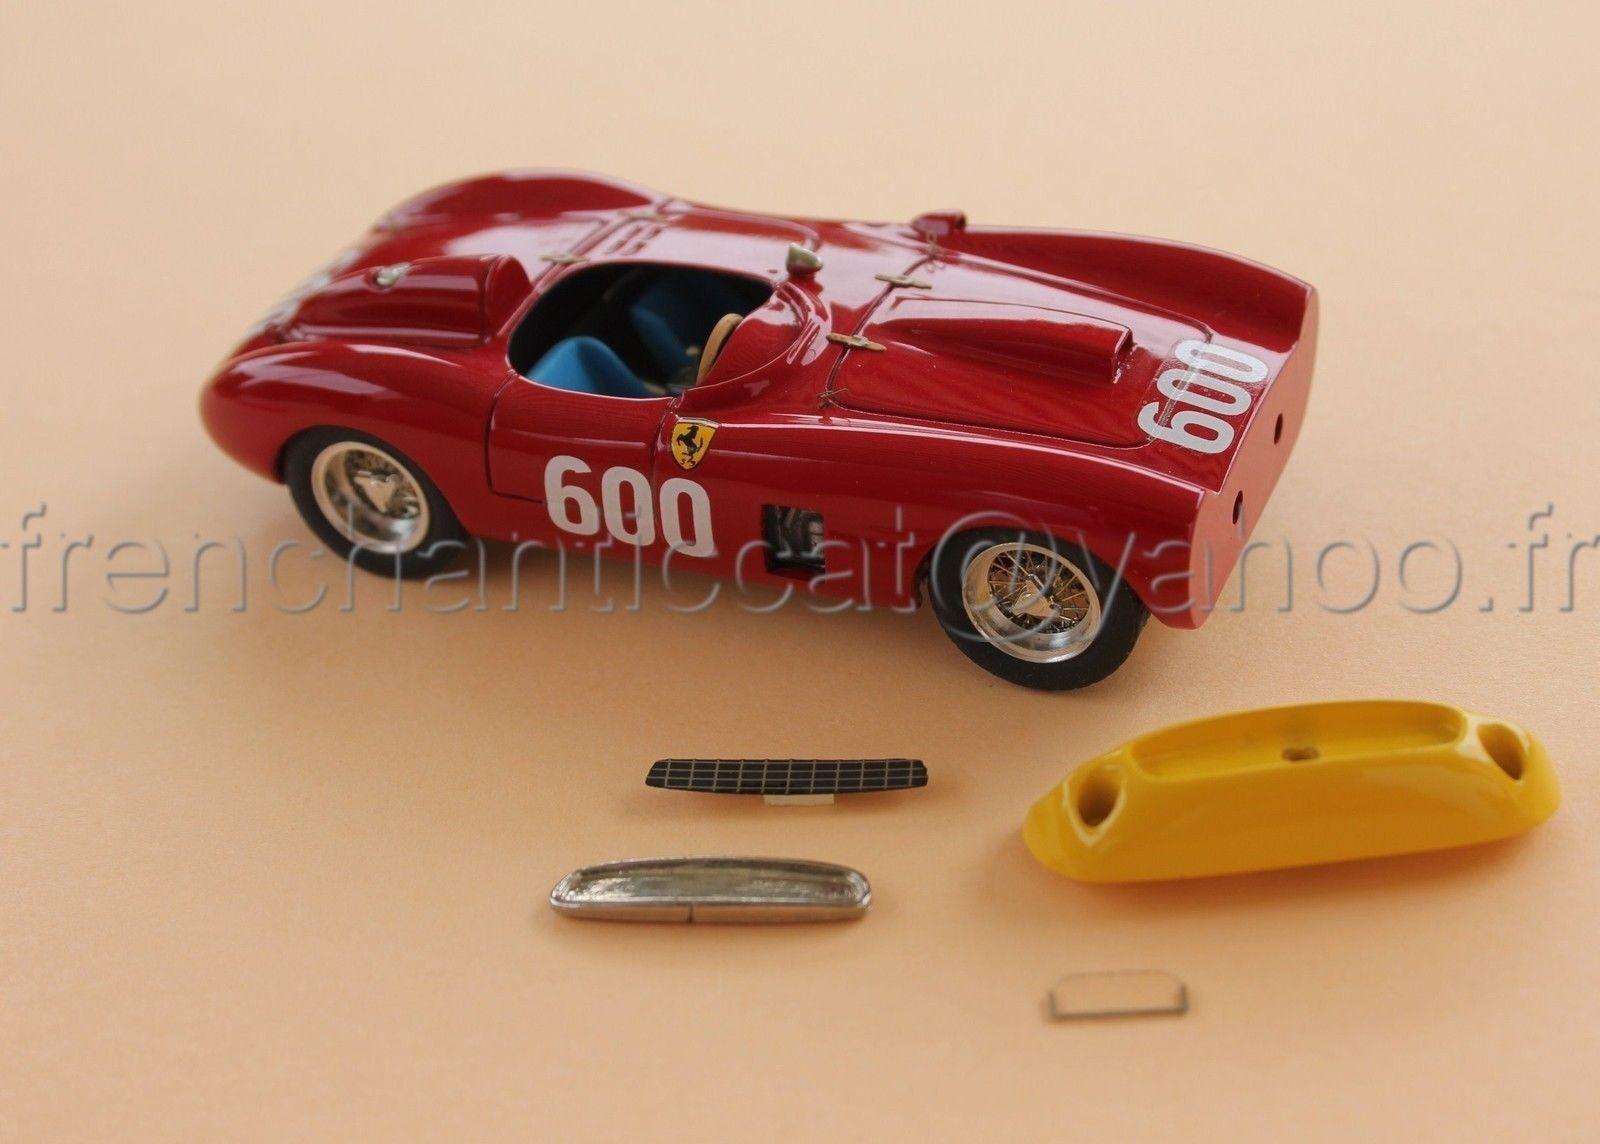 C108 voiture 143 FERRARI 290 Mile miglia 1956 collector Heco miniature provence